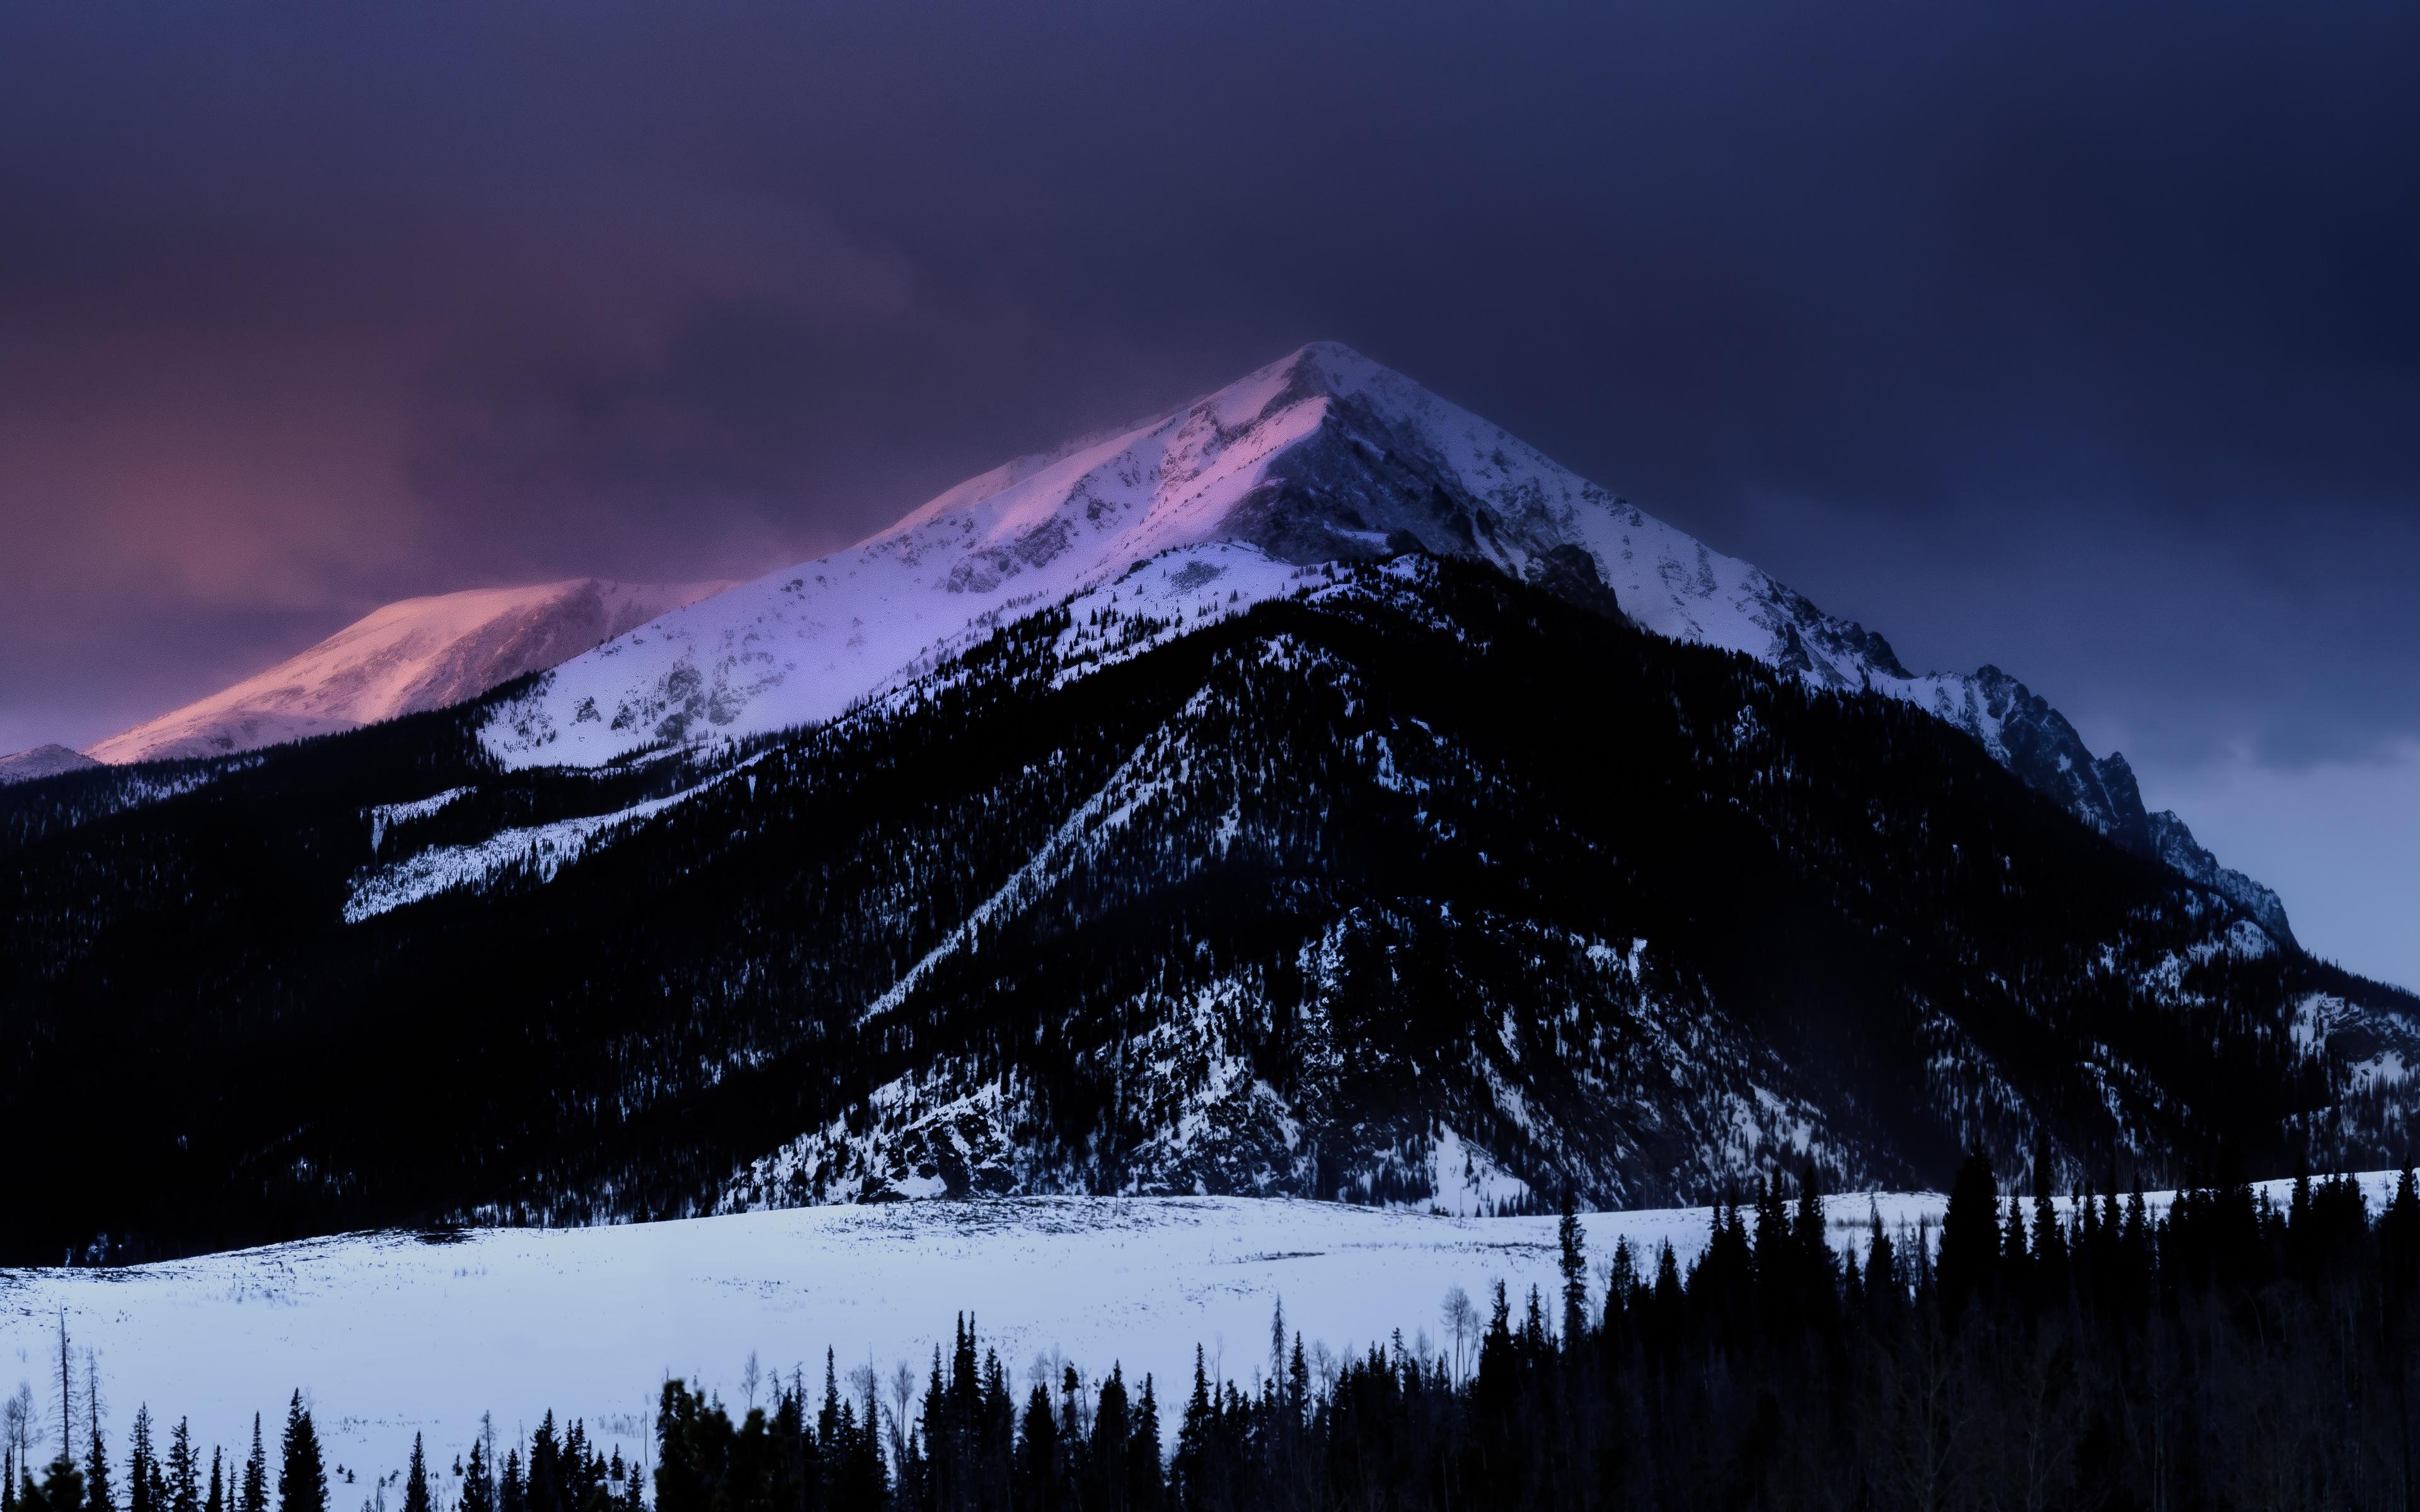 dawn-mountain-nature-snow-winter-new.jpg